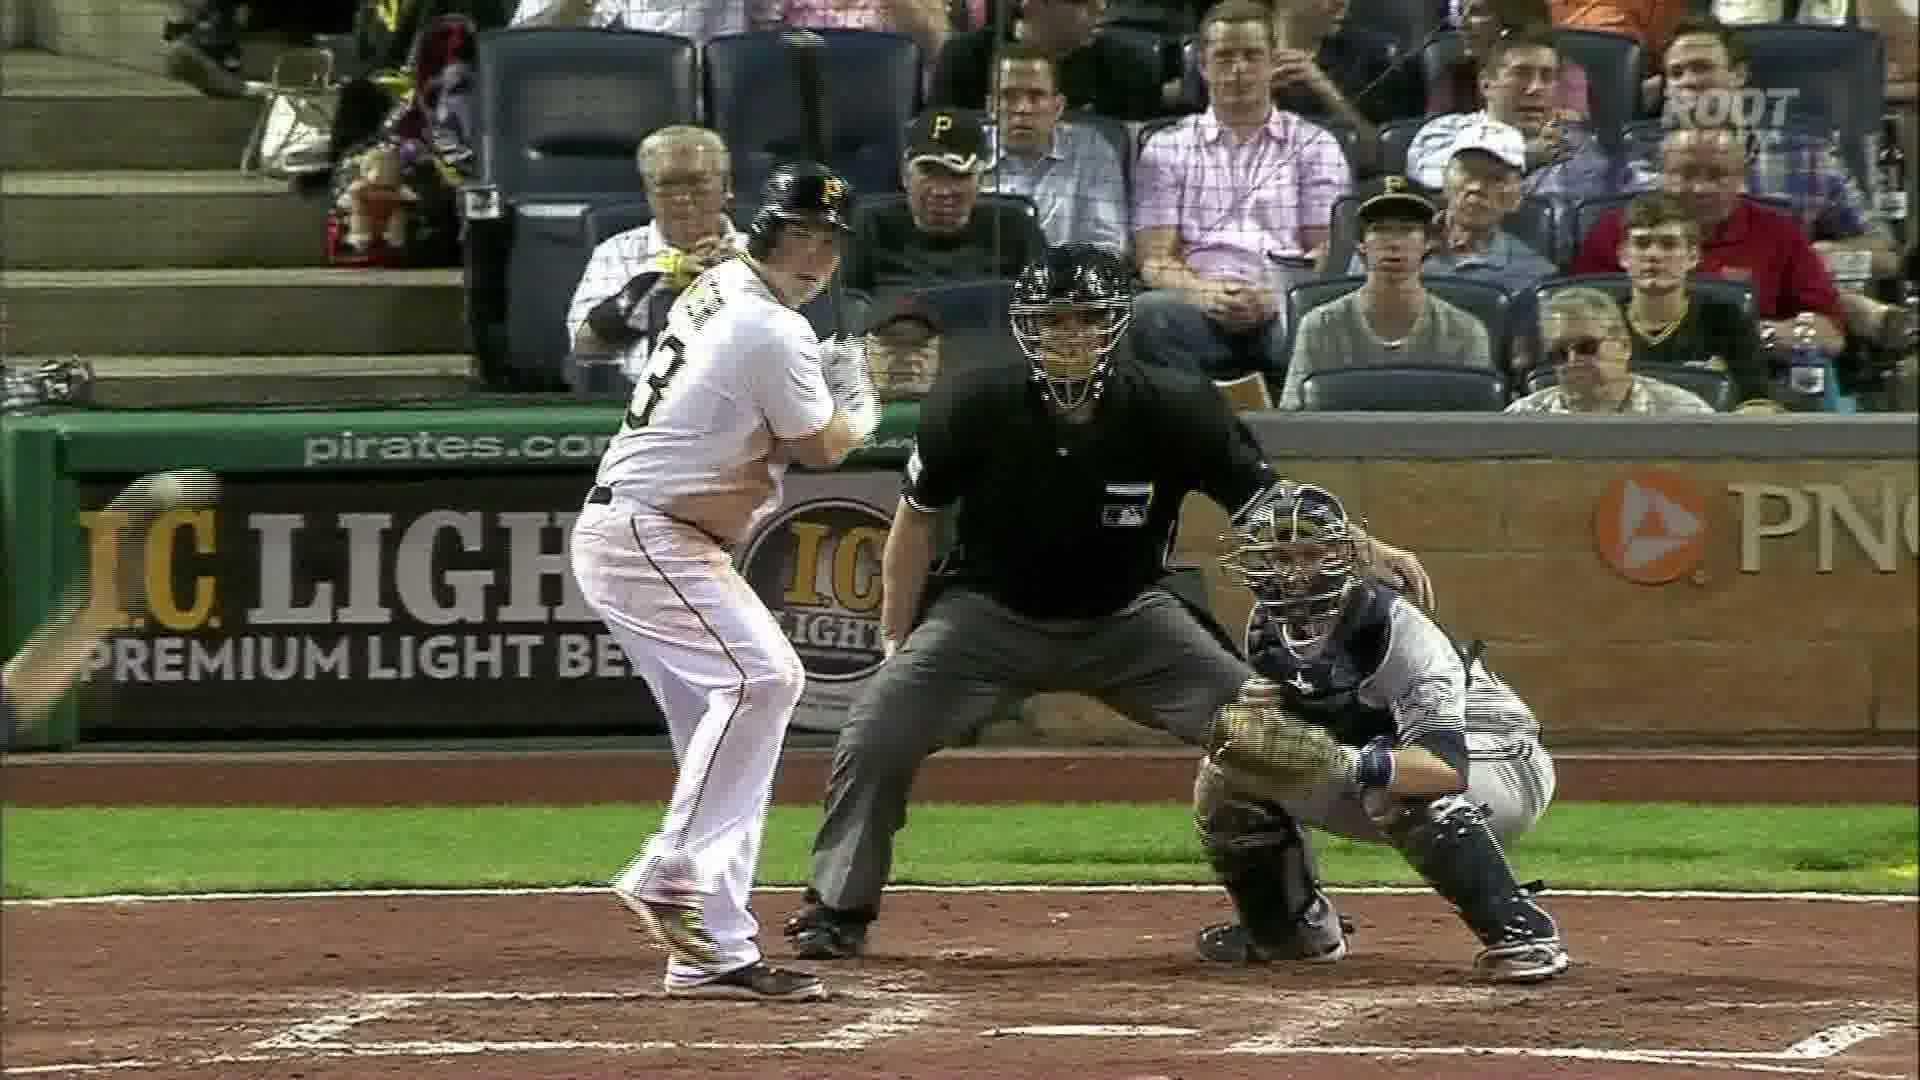 Travis Snider hits home run